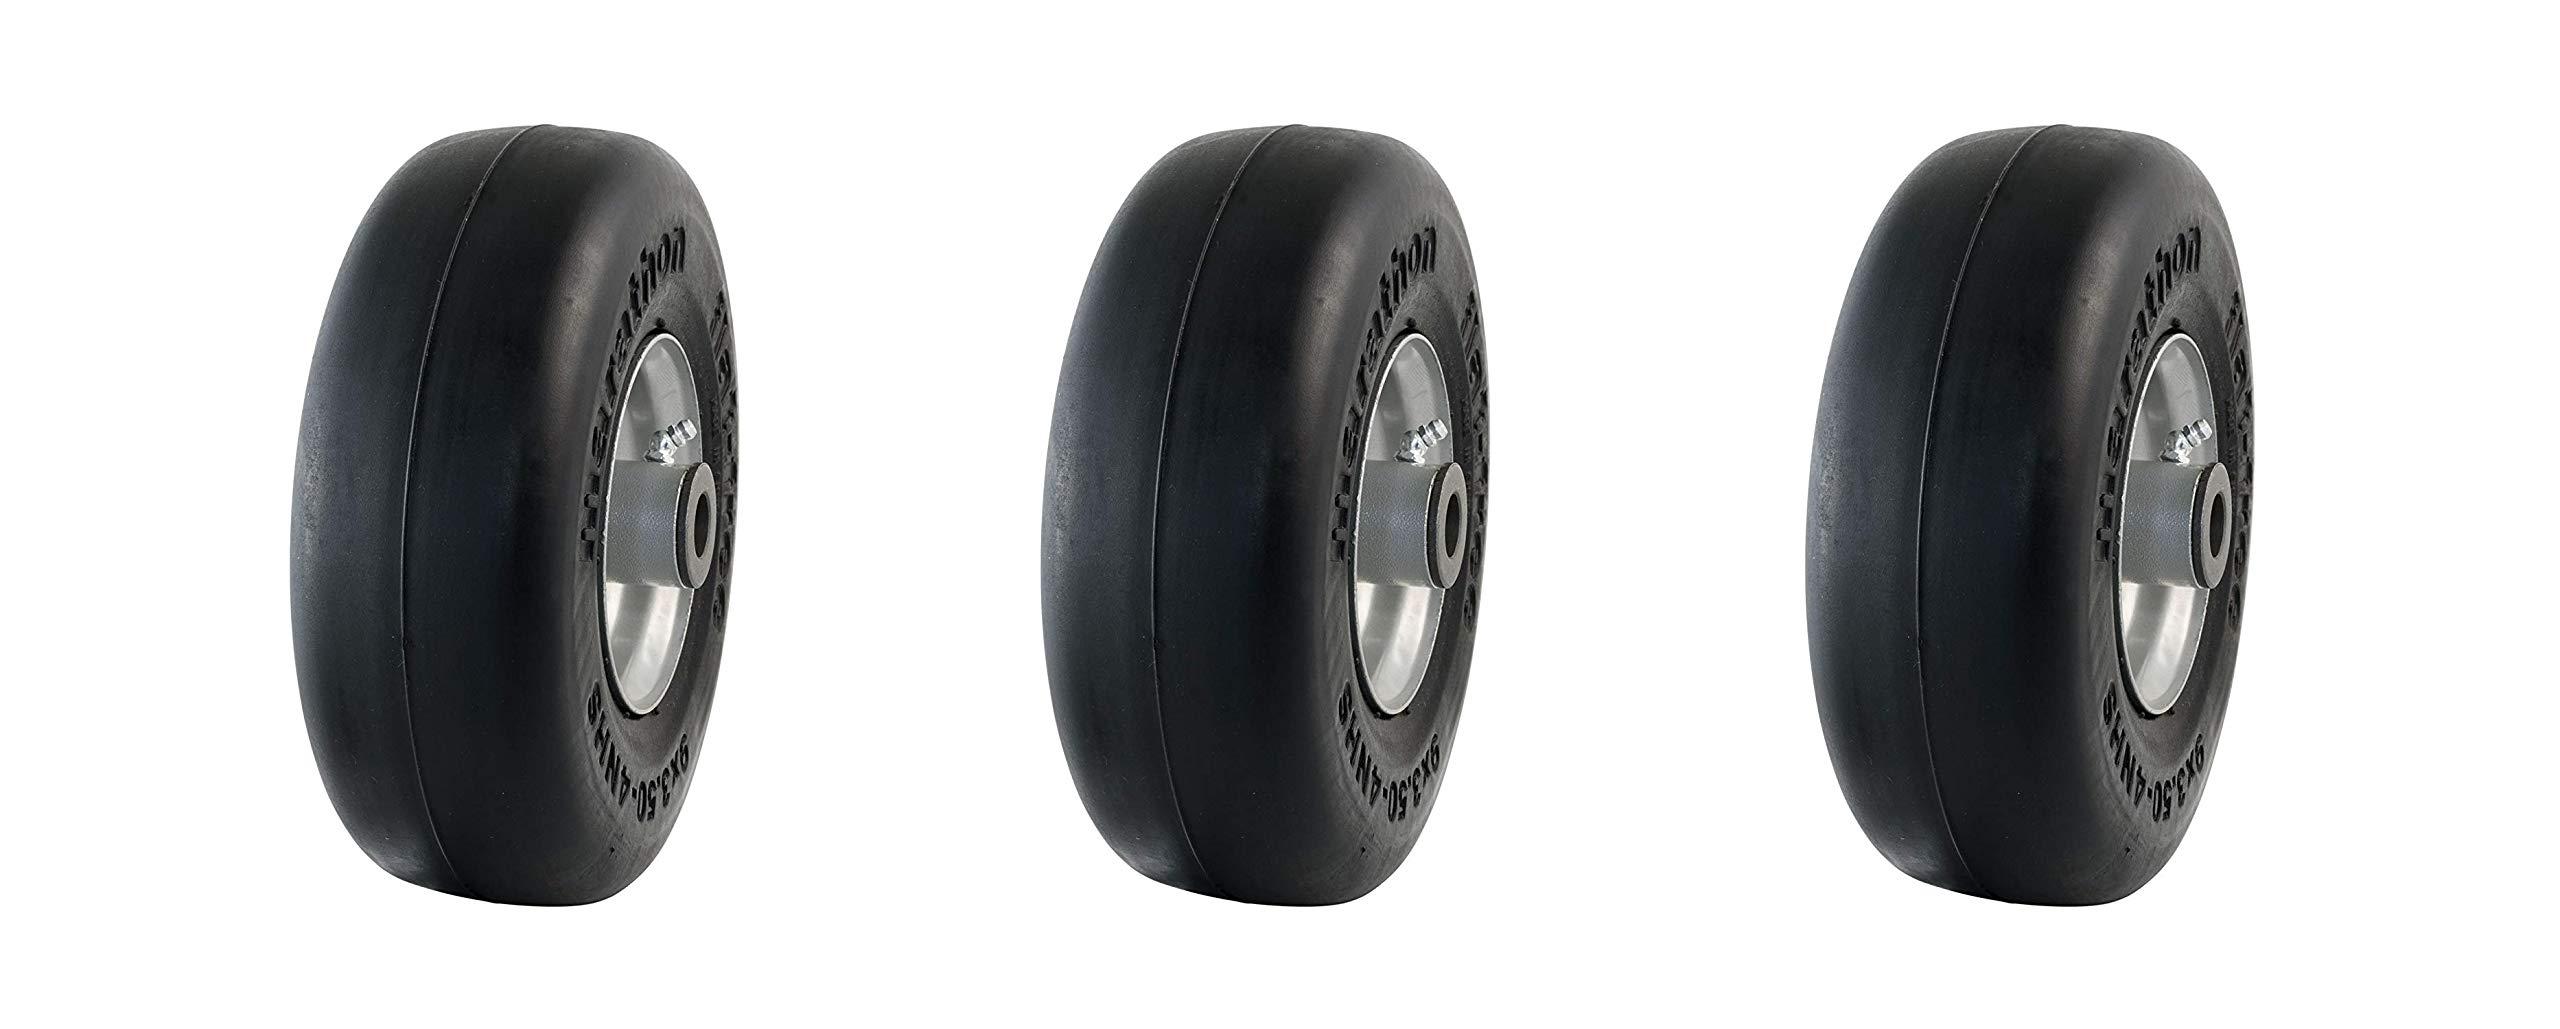 Marathon 9x3.50-4'' Flat Free Tire on Wheel, 4'' Centered Hub, 3/4'' Bushings (Pack of 3) by Marathon Industries